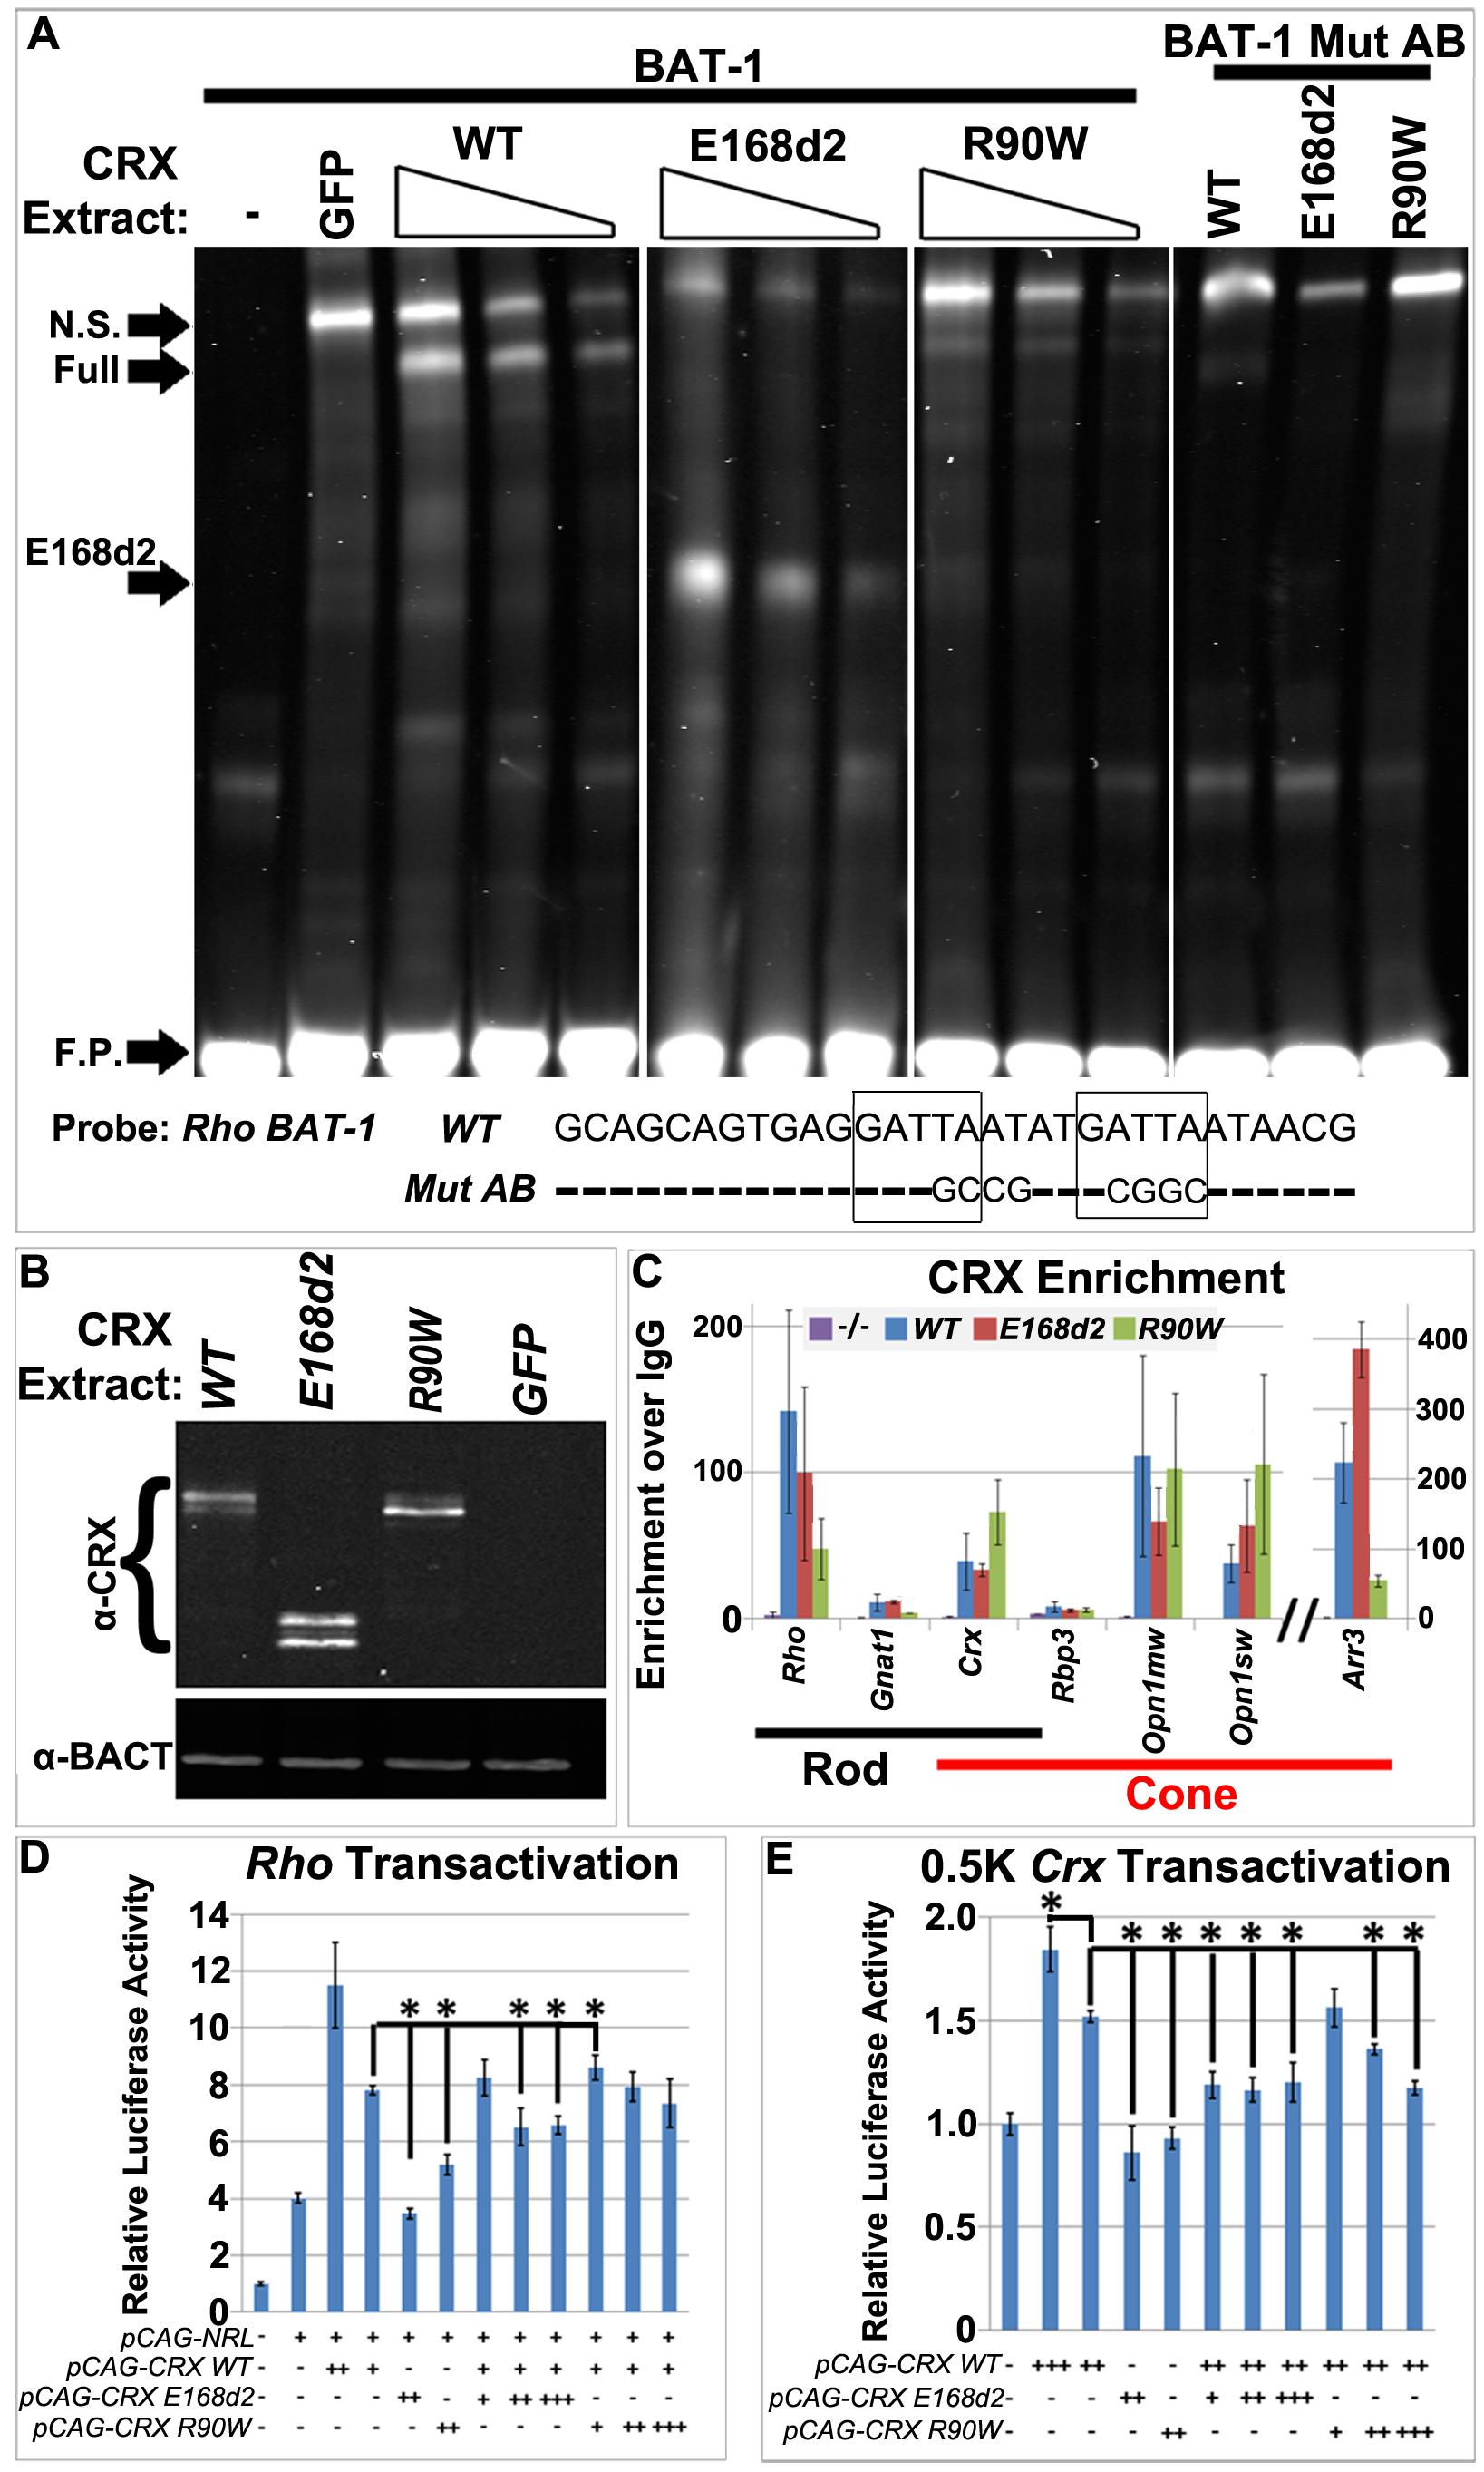 CRX<sup>[E168d2]</sup> and CRX<sup>[R90W]</sup> affect target gene transcription through distinct molecular mechanisms.